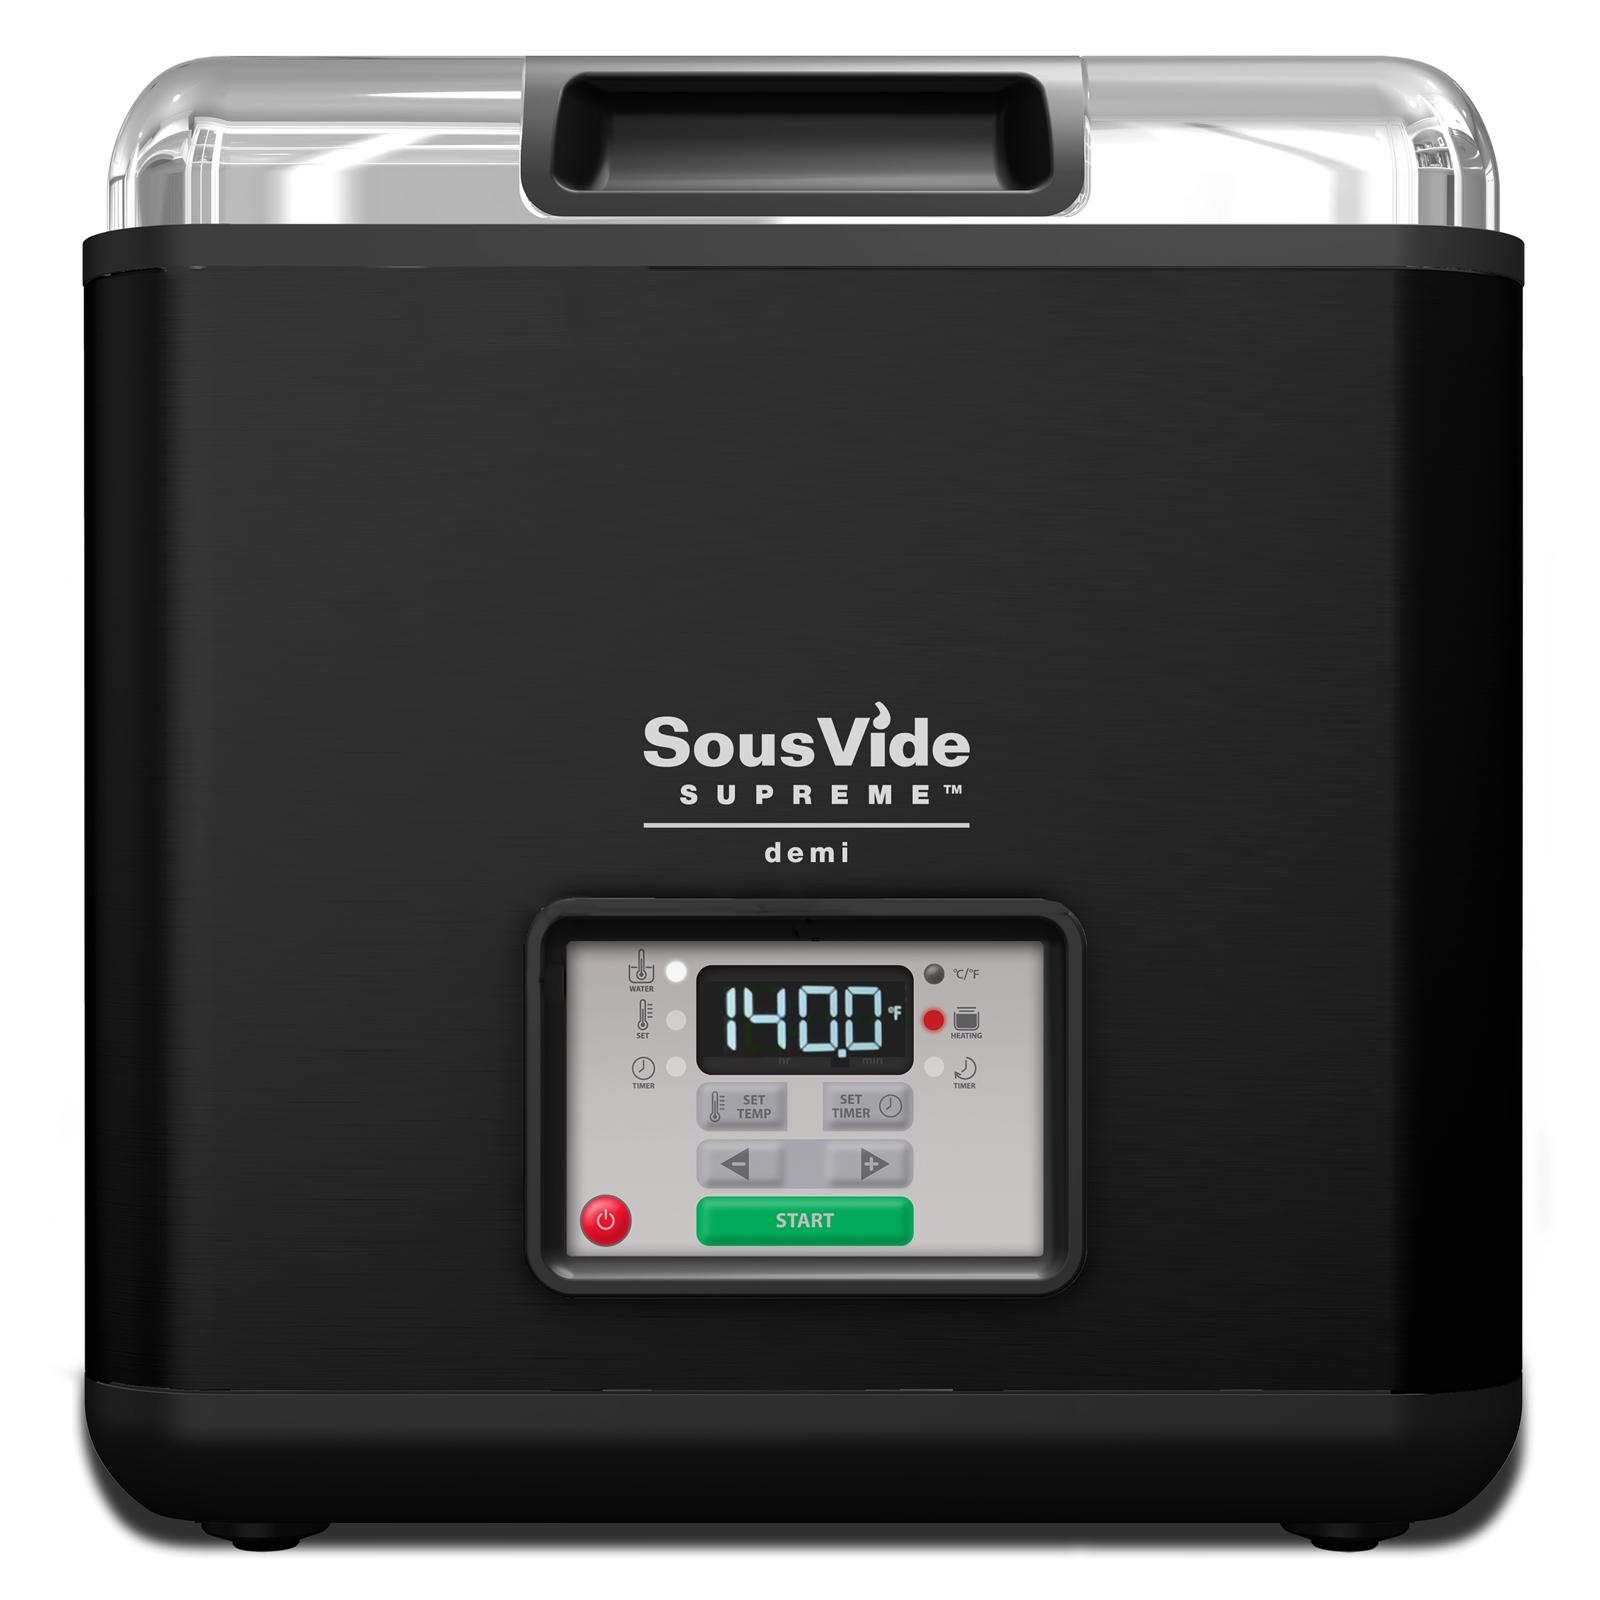 SousVide Supreme Demi Black 9 Liter Water Oven System Complete Set